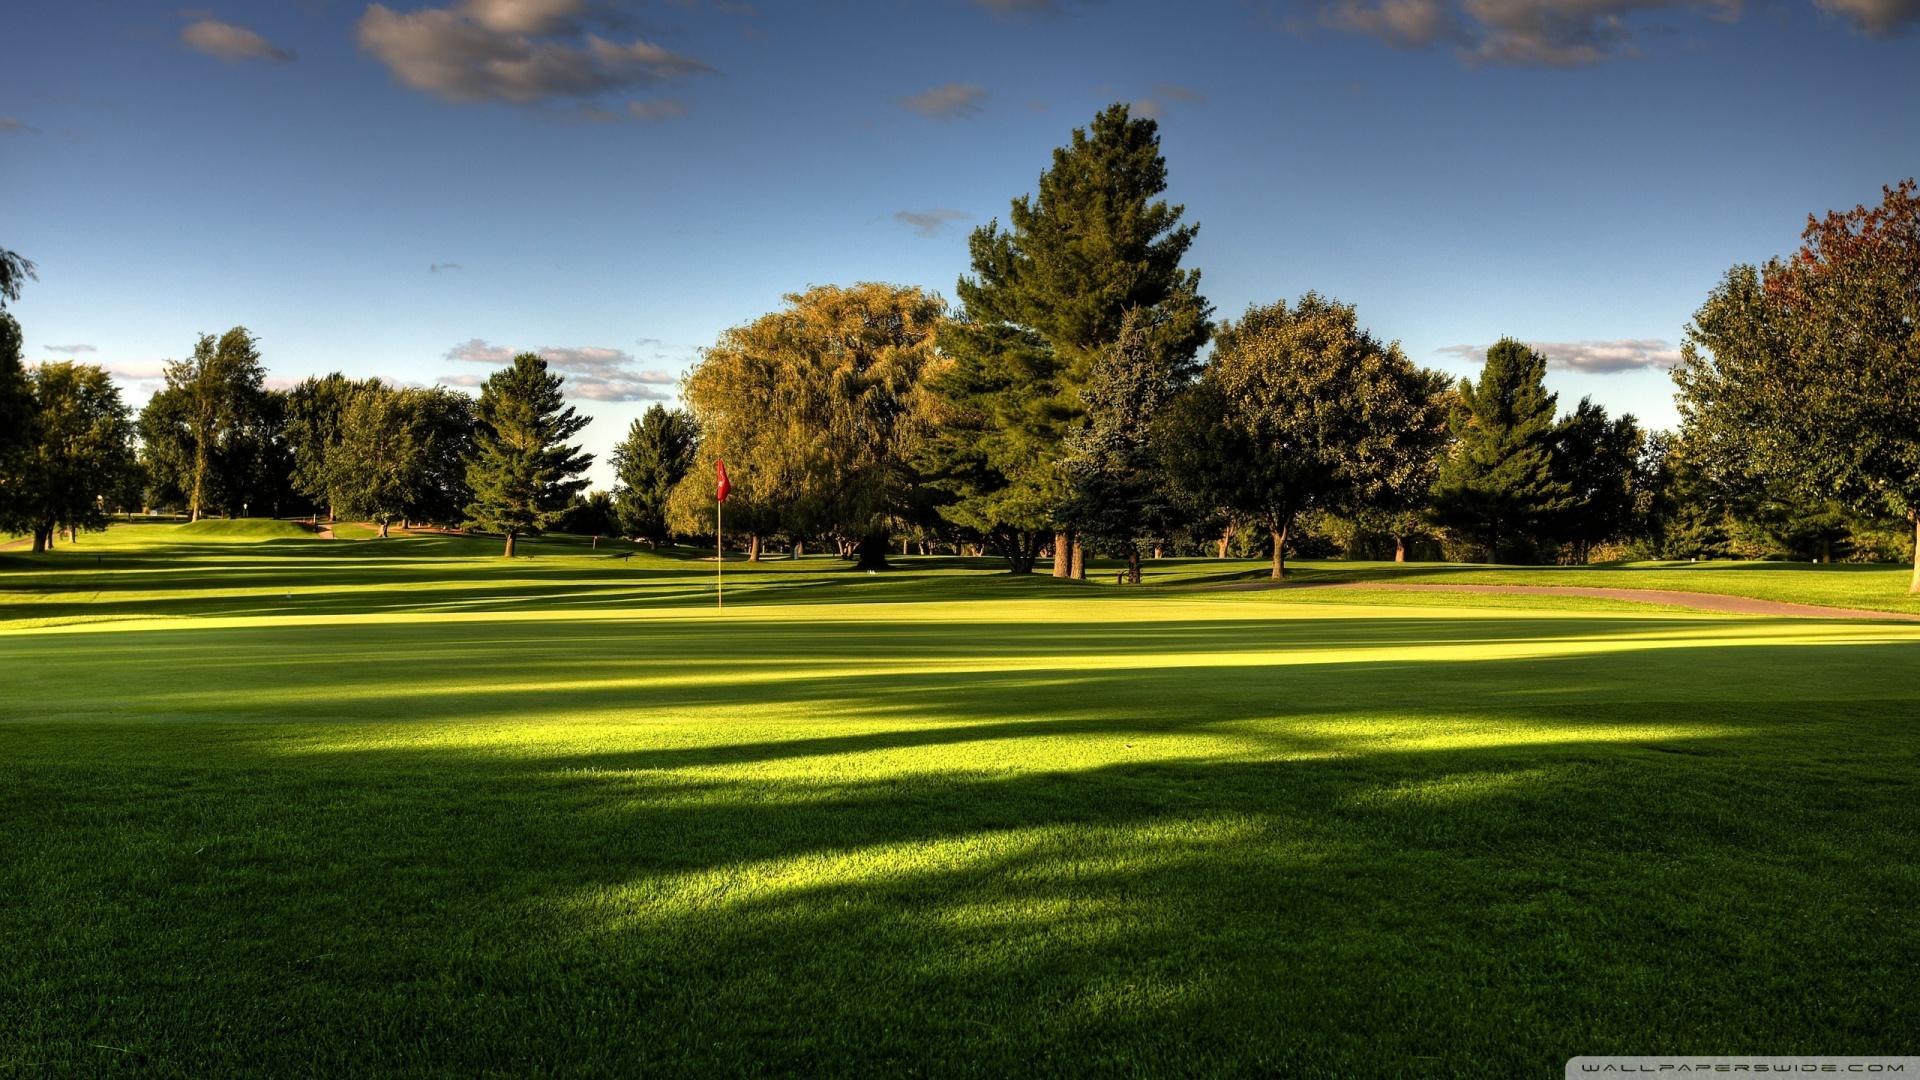 Beautiful Golf Course Wallpaper 1920x1080 Beautiful Golf Course 1920x1080